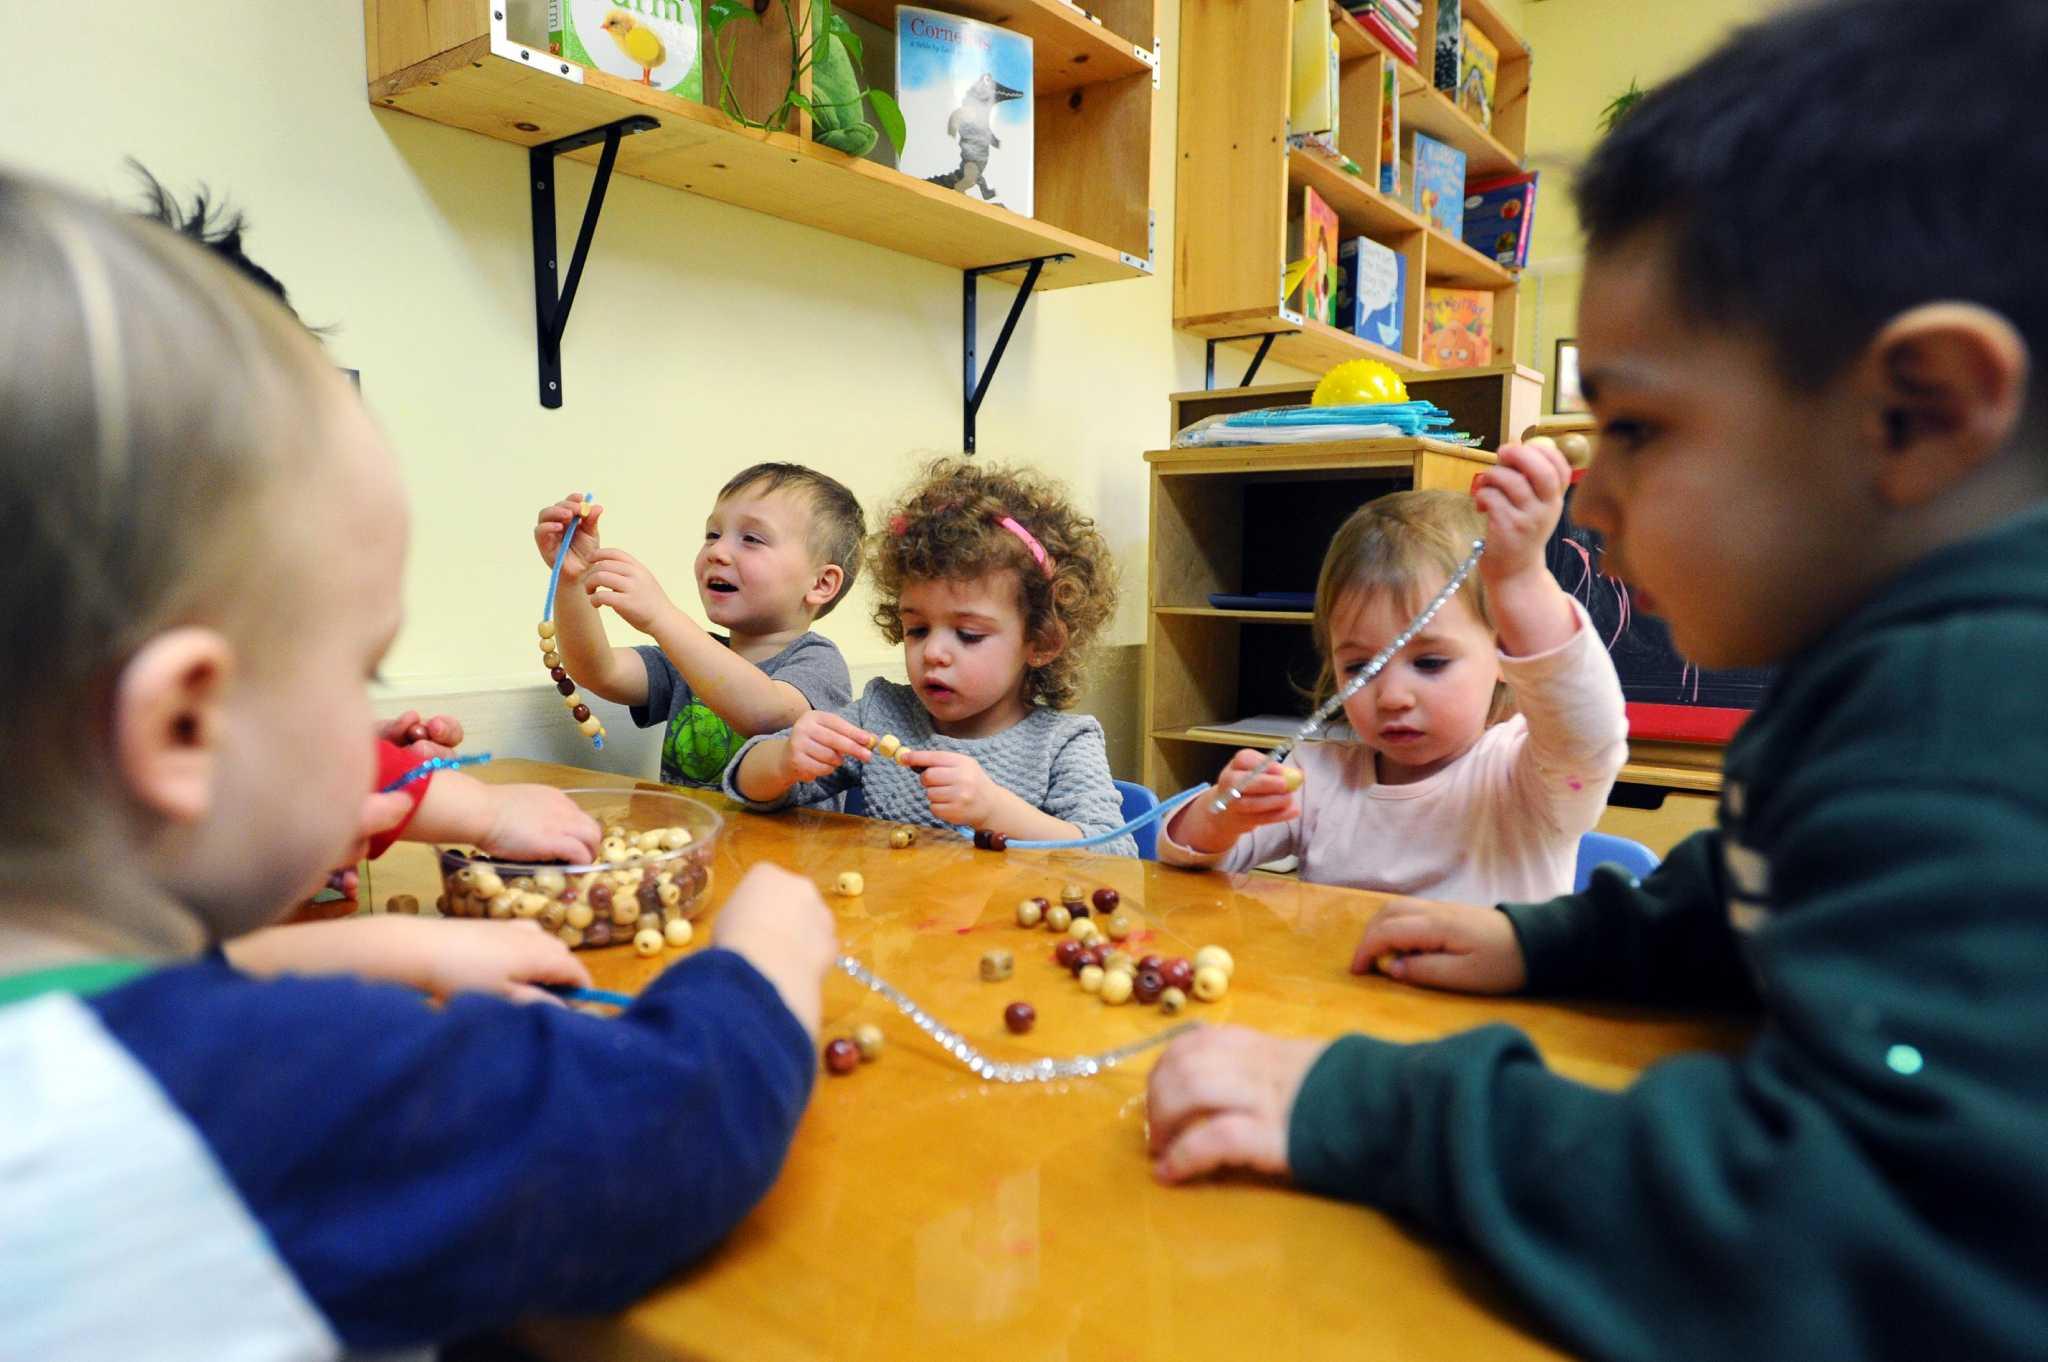 New Private Preschool Opens In Stamford Stamfordadvocate